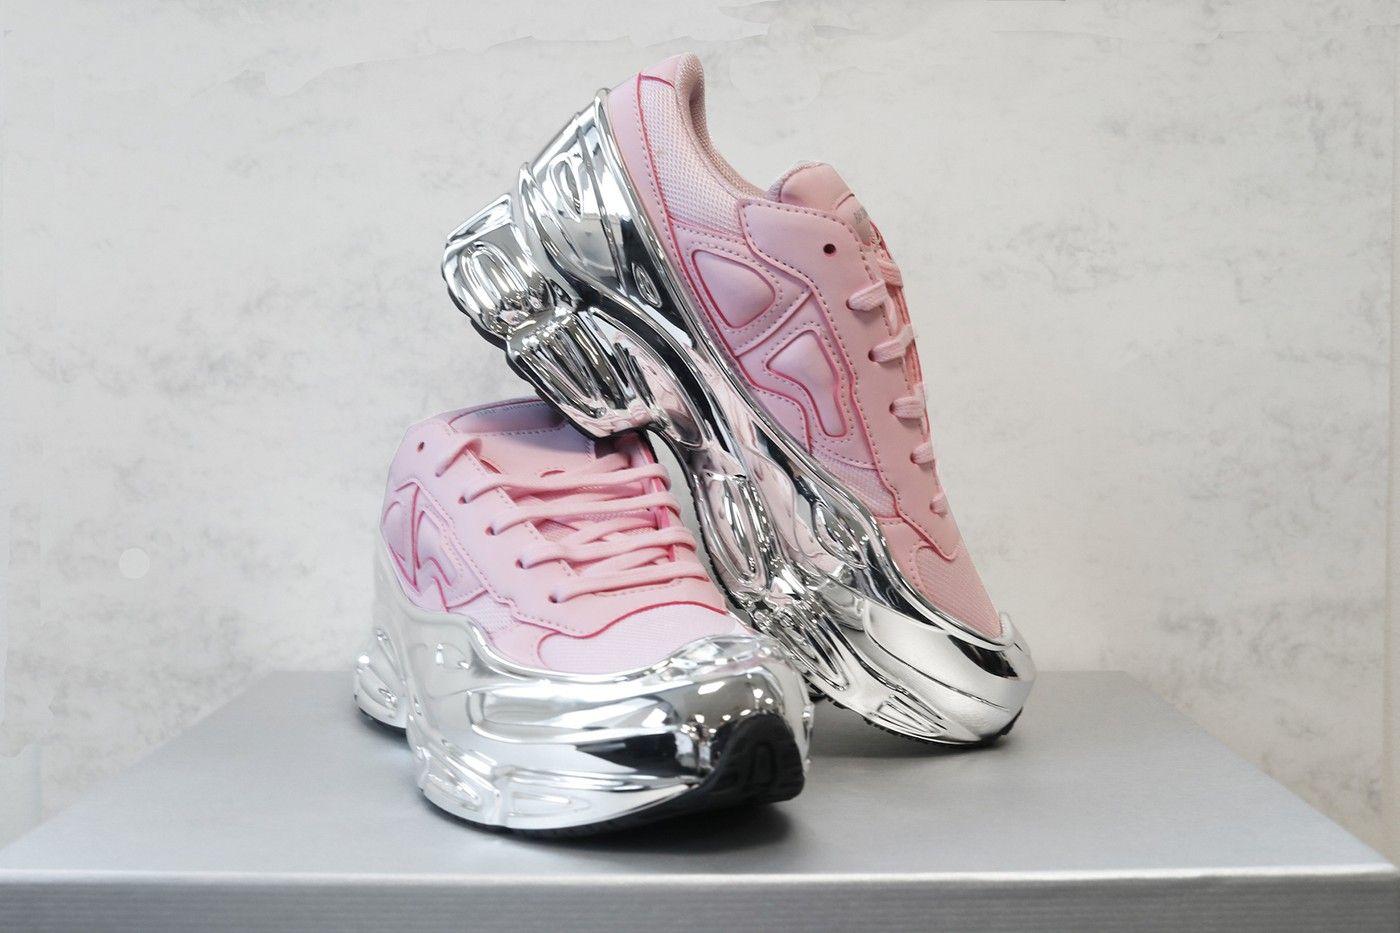 Top 3 sneaker